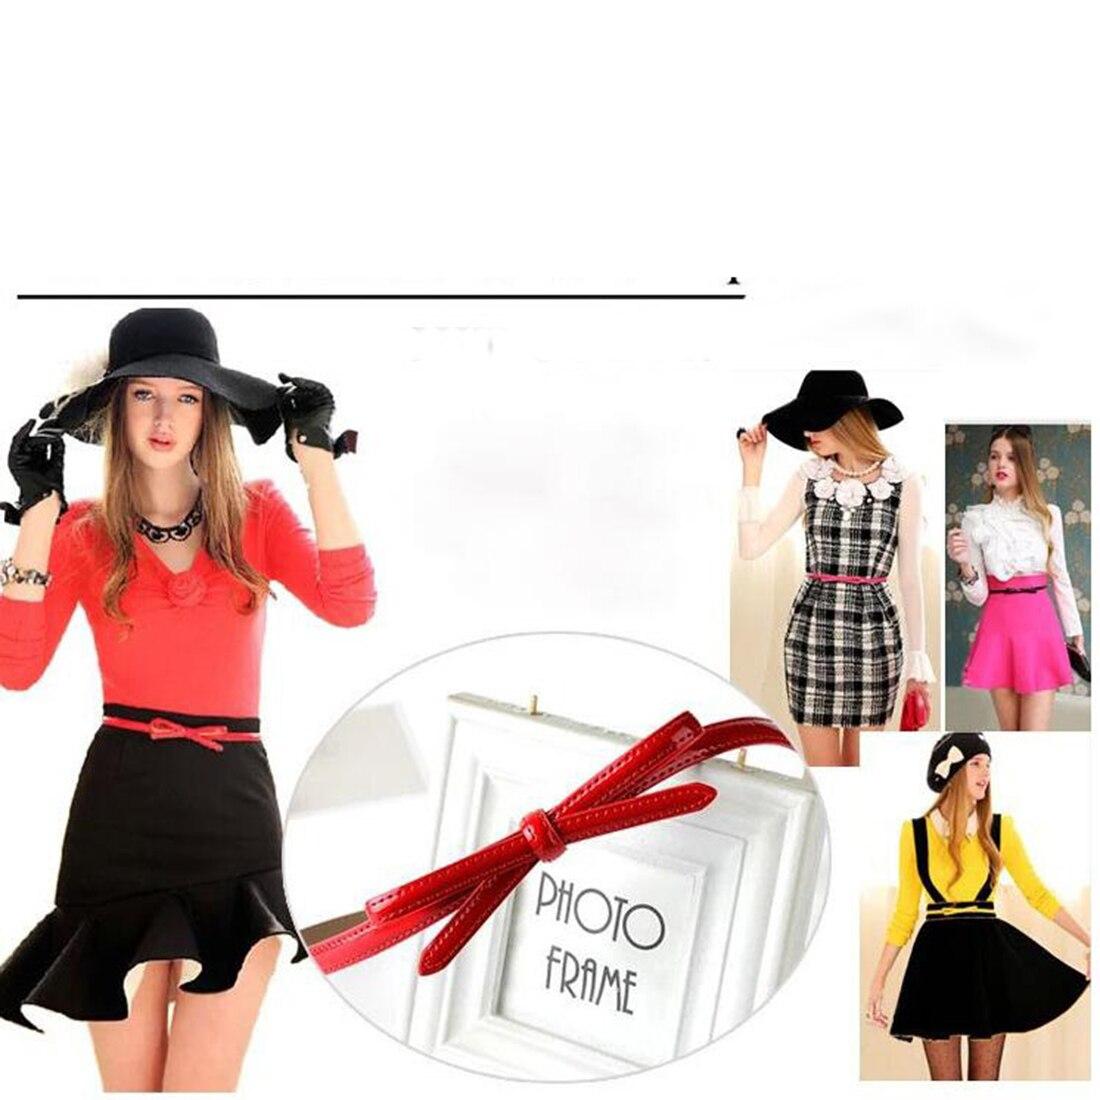 2018 New High Quality Bow Belt Decorative Women Faux Leather Red Bowknot Belt Slim Thin Waist Belt Summer Mini Dress Bow Waist in Women 39 s Belts from Apparel Accessories